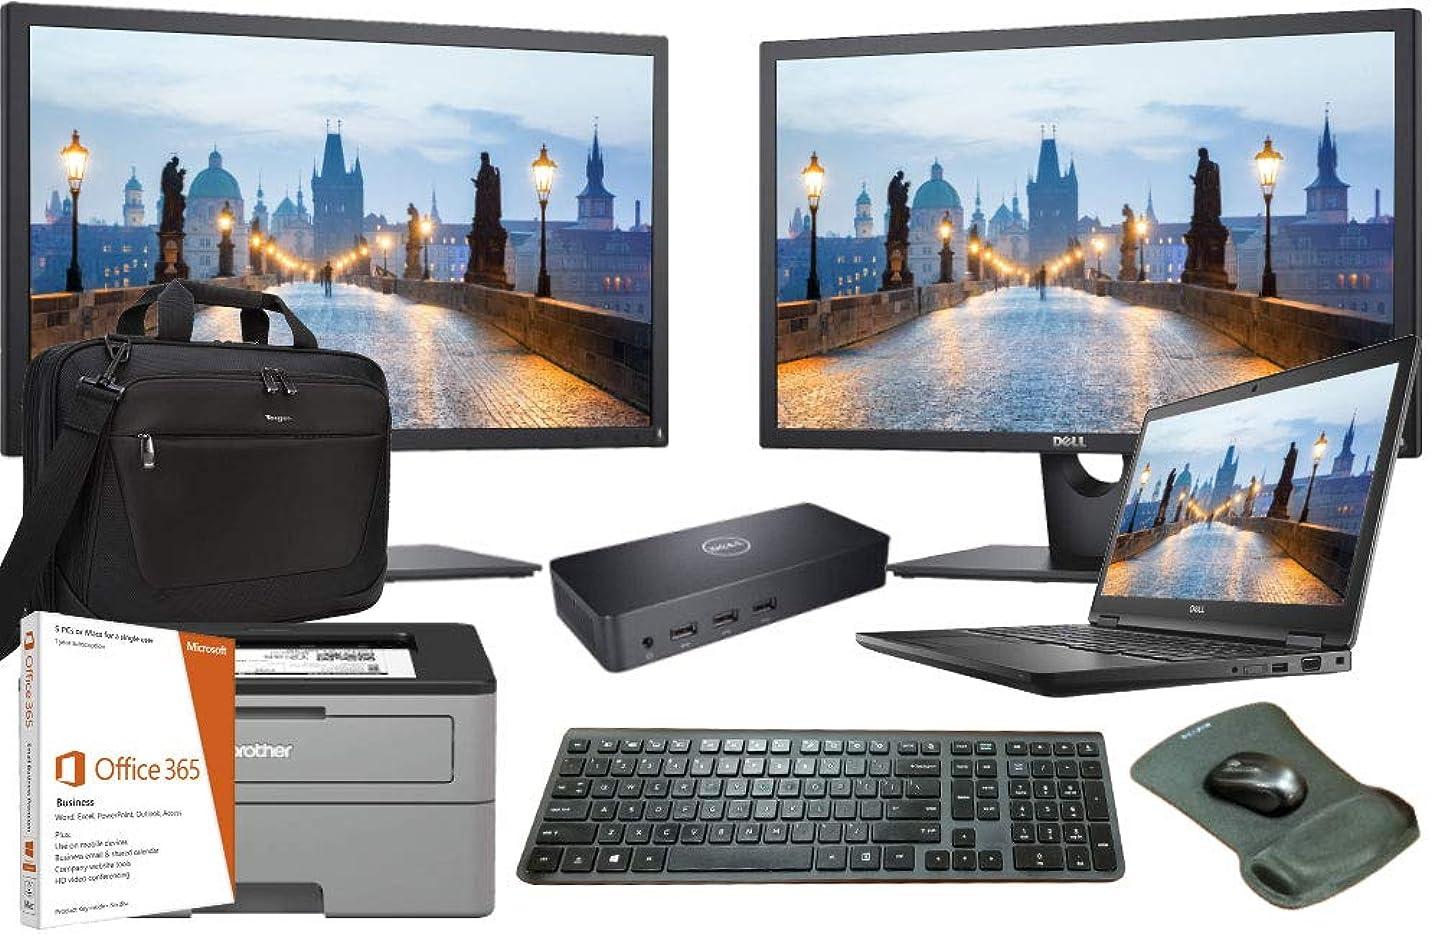 Latitude 5590 Business Laptop Bundle, Intel i7-8650U Quad Core, 16GB RAM, 1TB SSD, Windows 10, Office 365, Printer, Dual FHD Monitors, Docking, Keyboard, Mouse, 3 Years Warranty